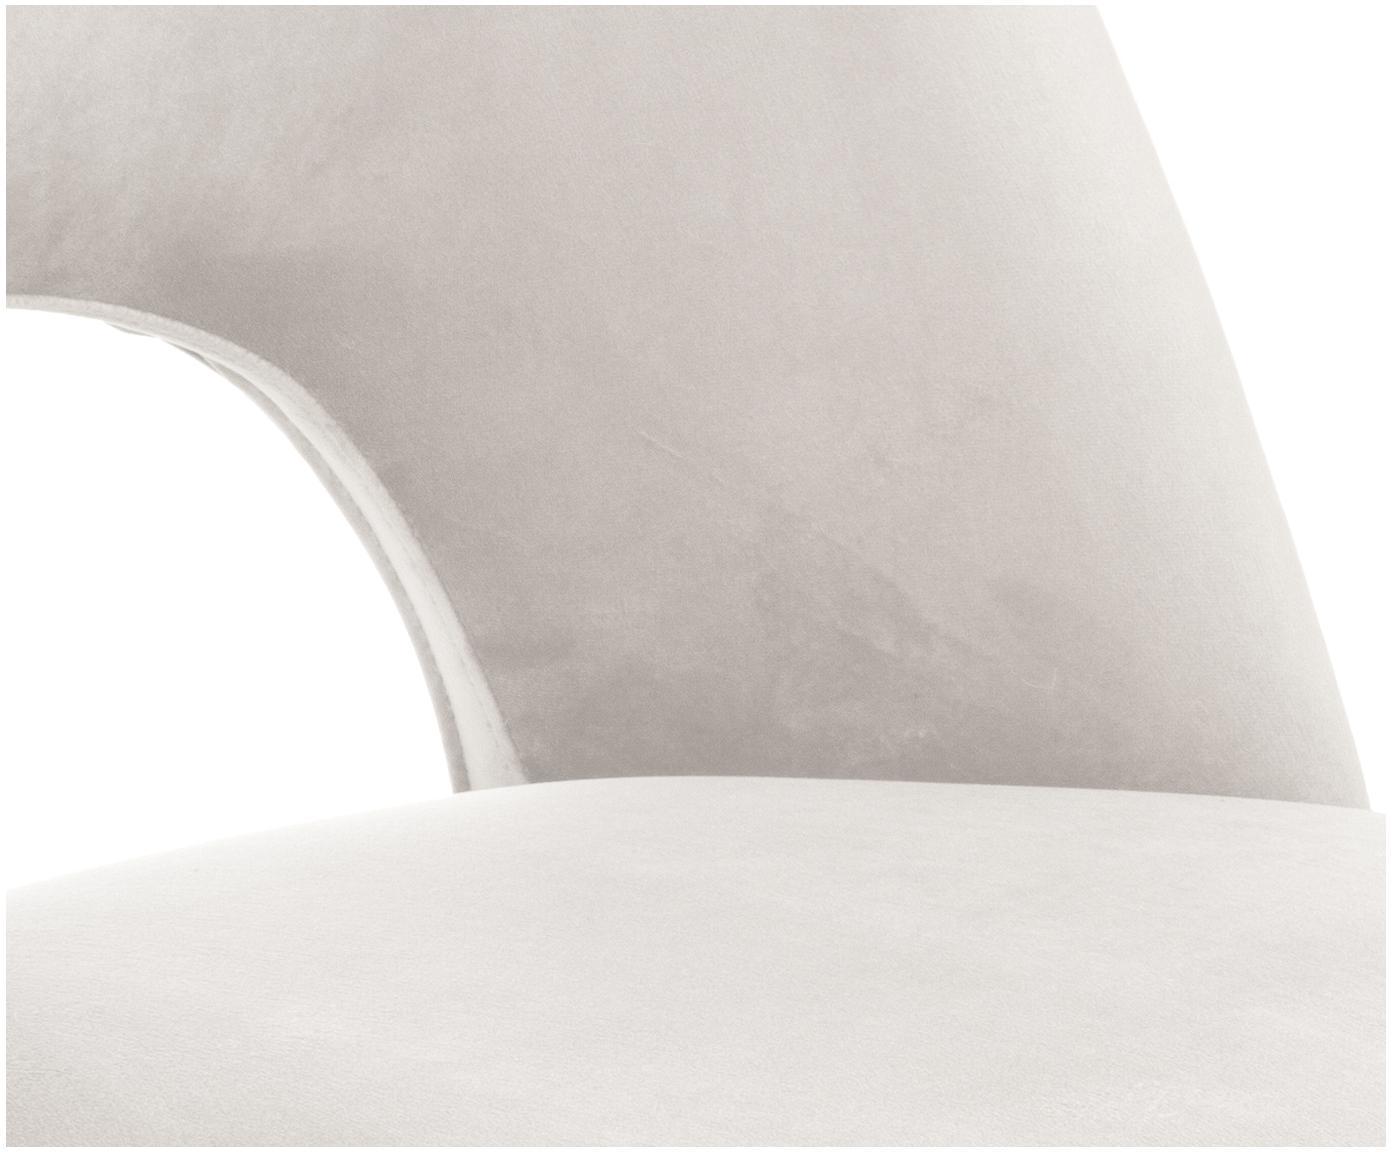 Sedia imbottita in velluto Rachel, Rivestimento: velluto (copertura in pol, Gambe: metallo verniciato a polv, Velluto beige, Larg. 53 x Prof. 57 cm